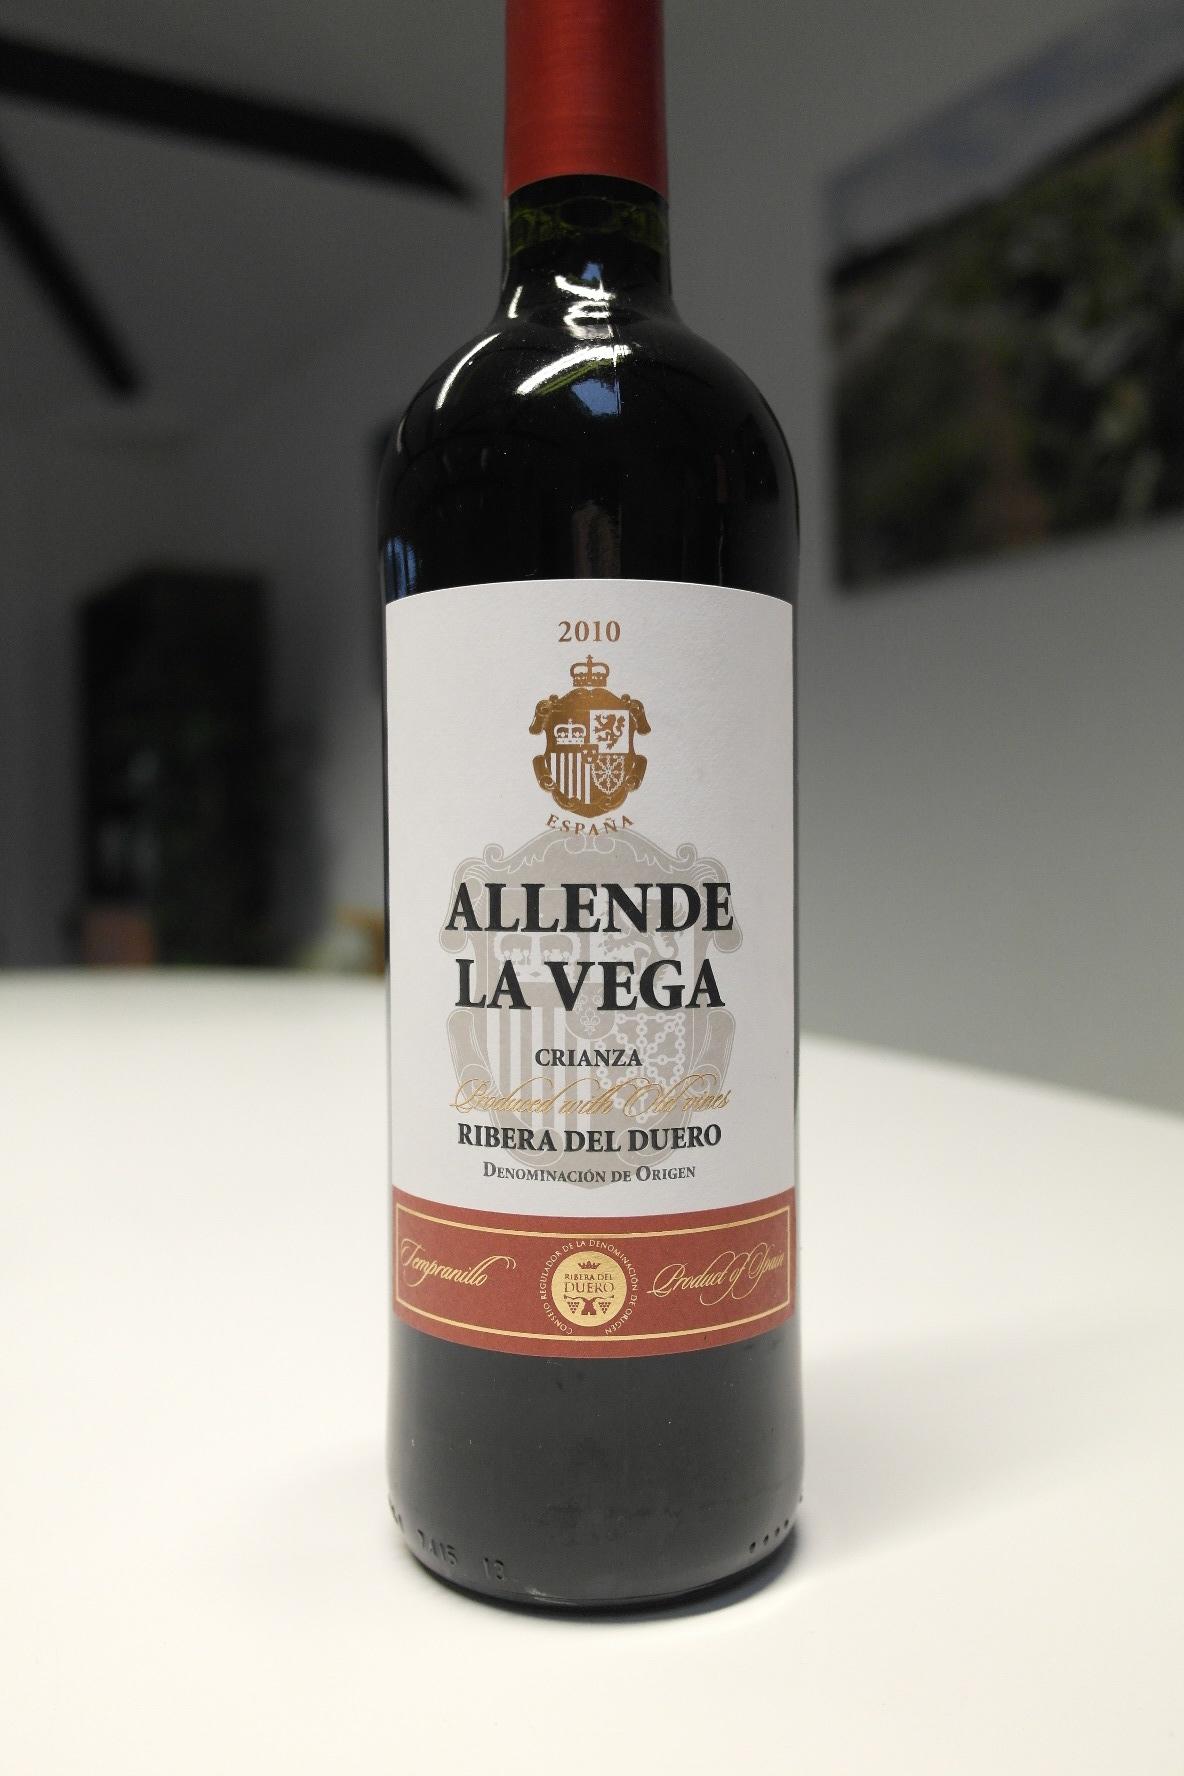 Allende la Vega 2010